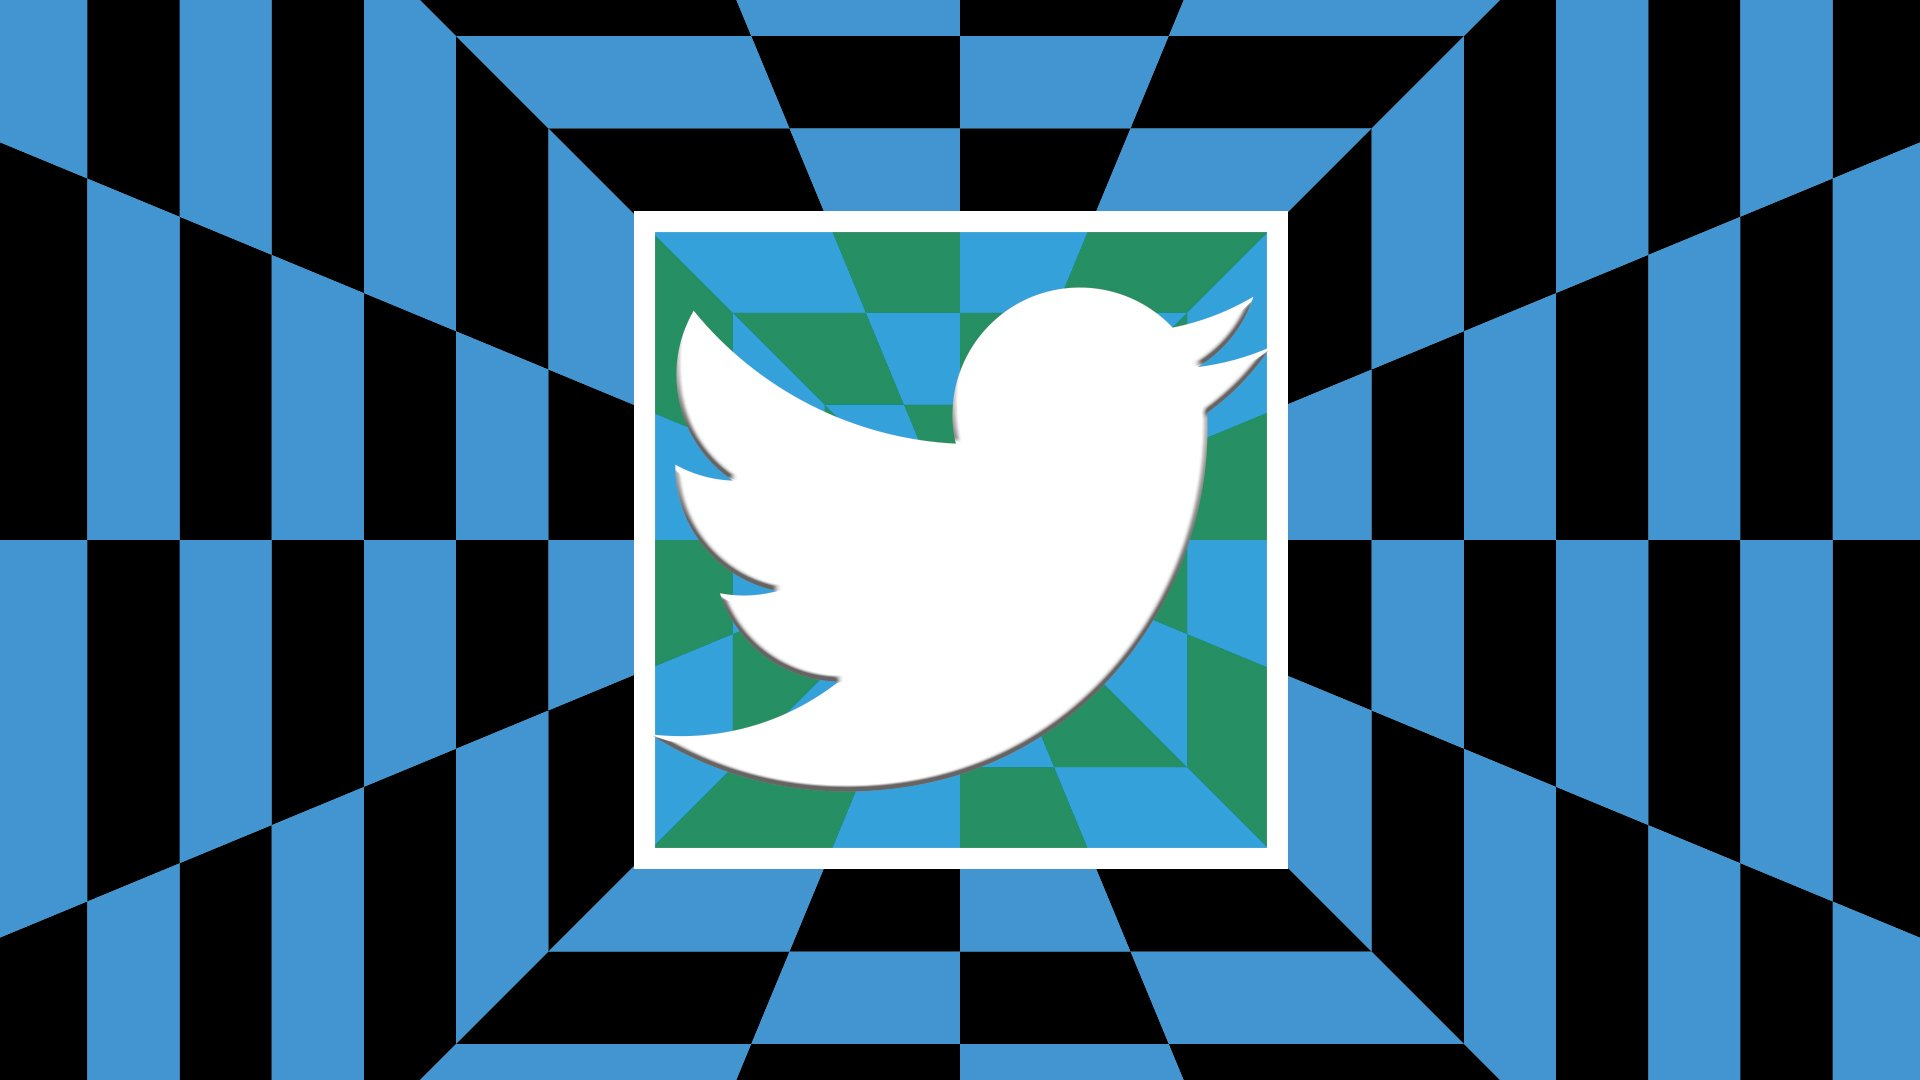 Twitter taps crypto developer to lead decentralized social media initiative Bluesky